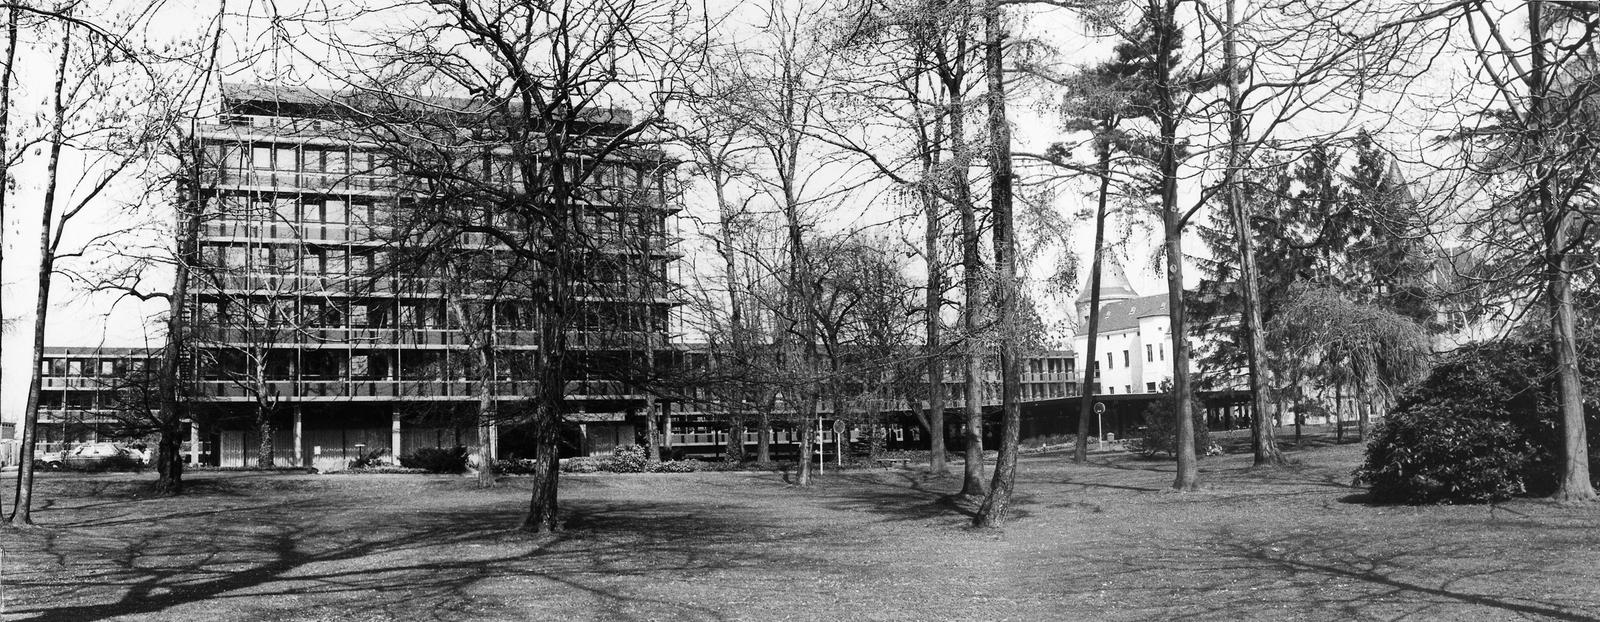 Bonn - Compound Site - 1979